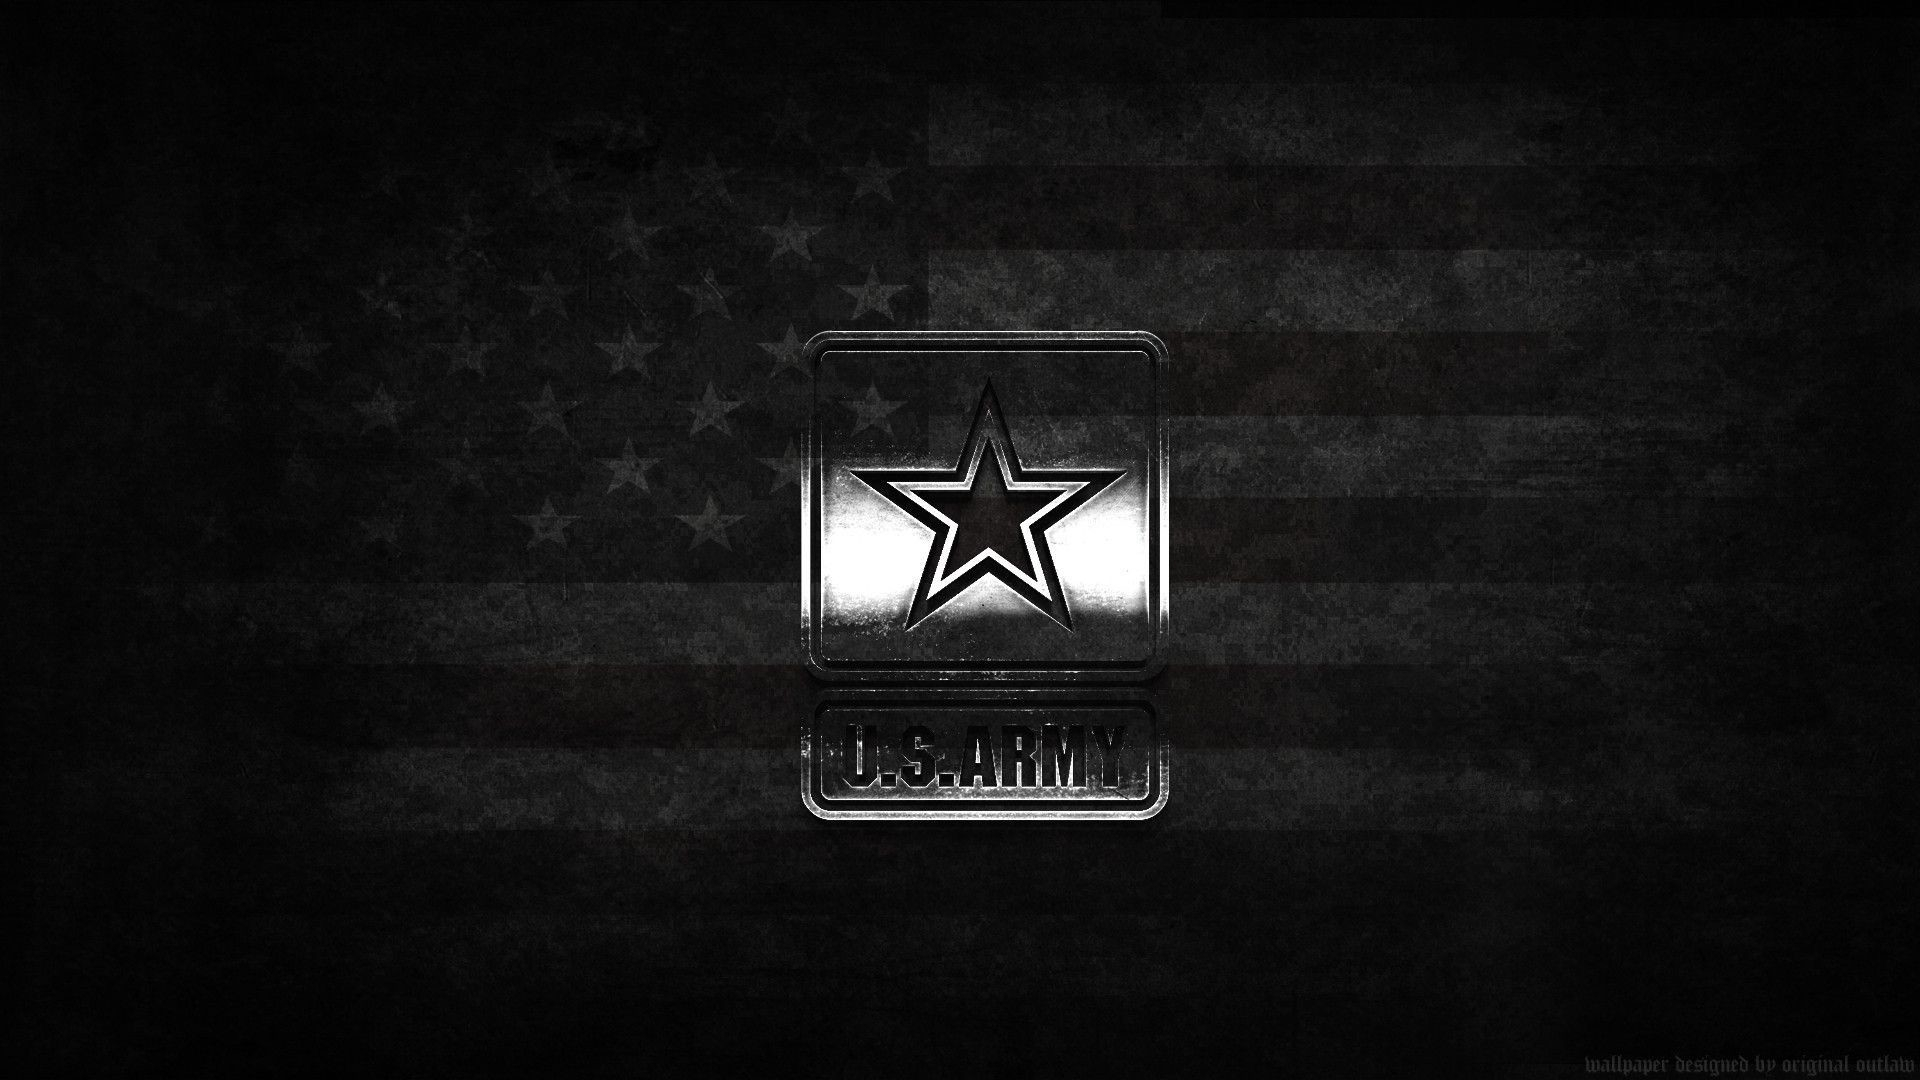 us army desktop wallpaper ·①